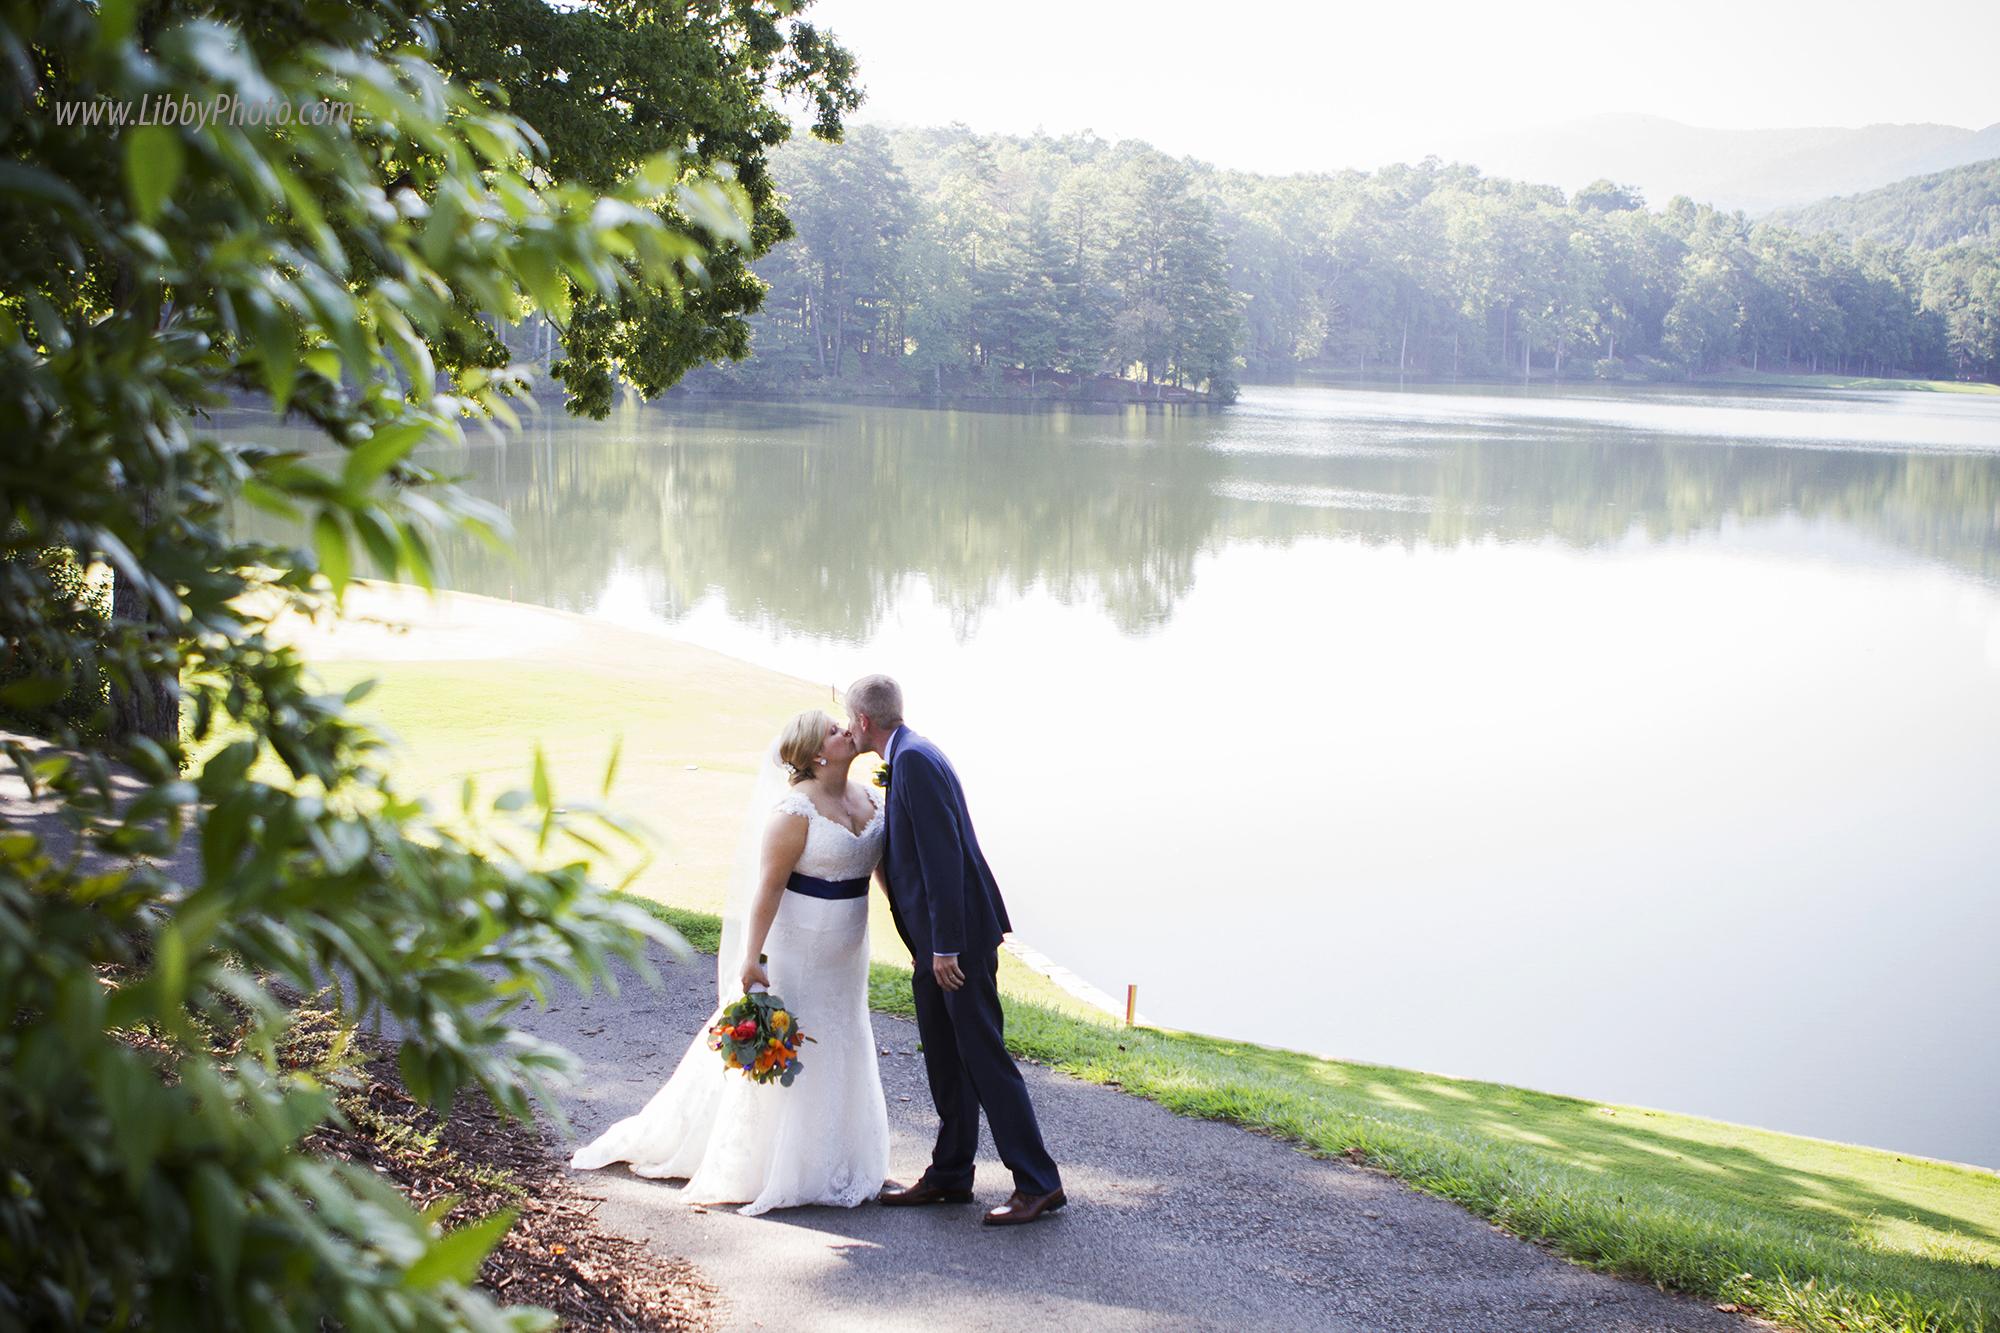 Atlanta wedding photography, Libbyphoto11 (16).jpg